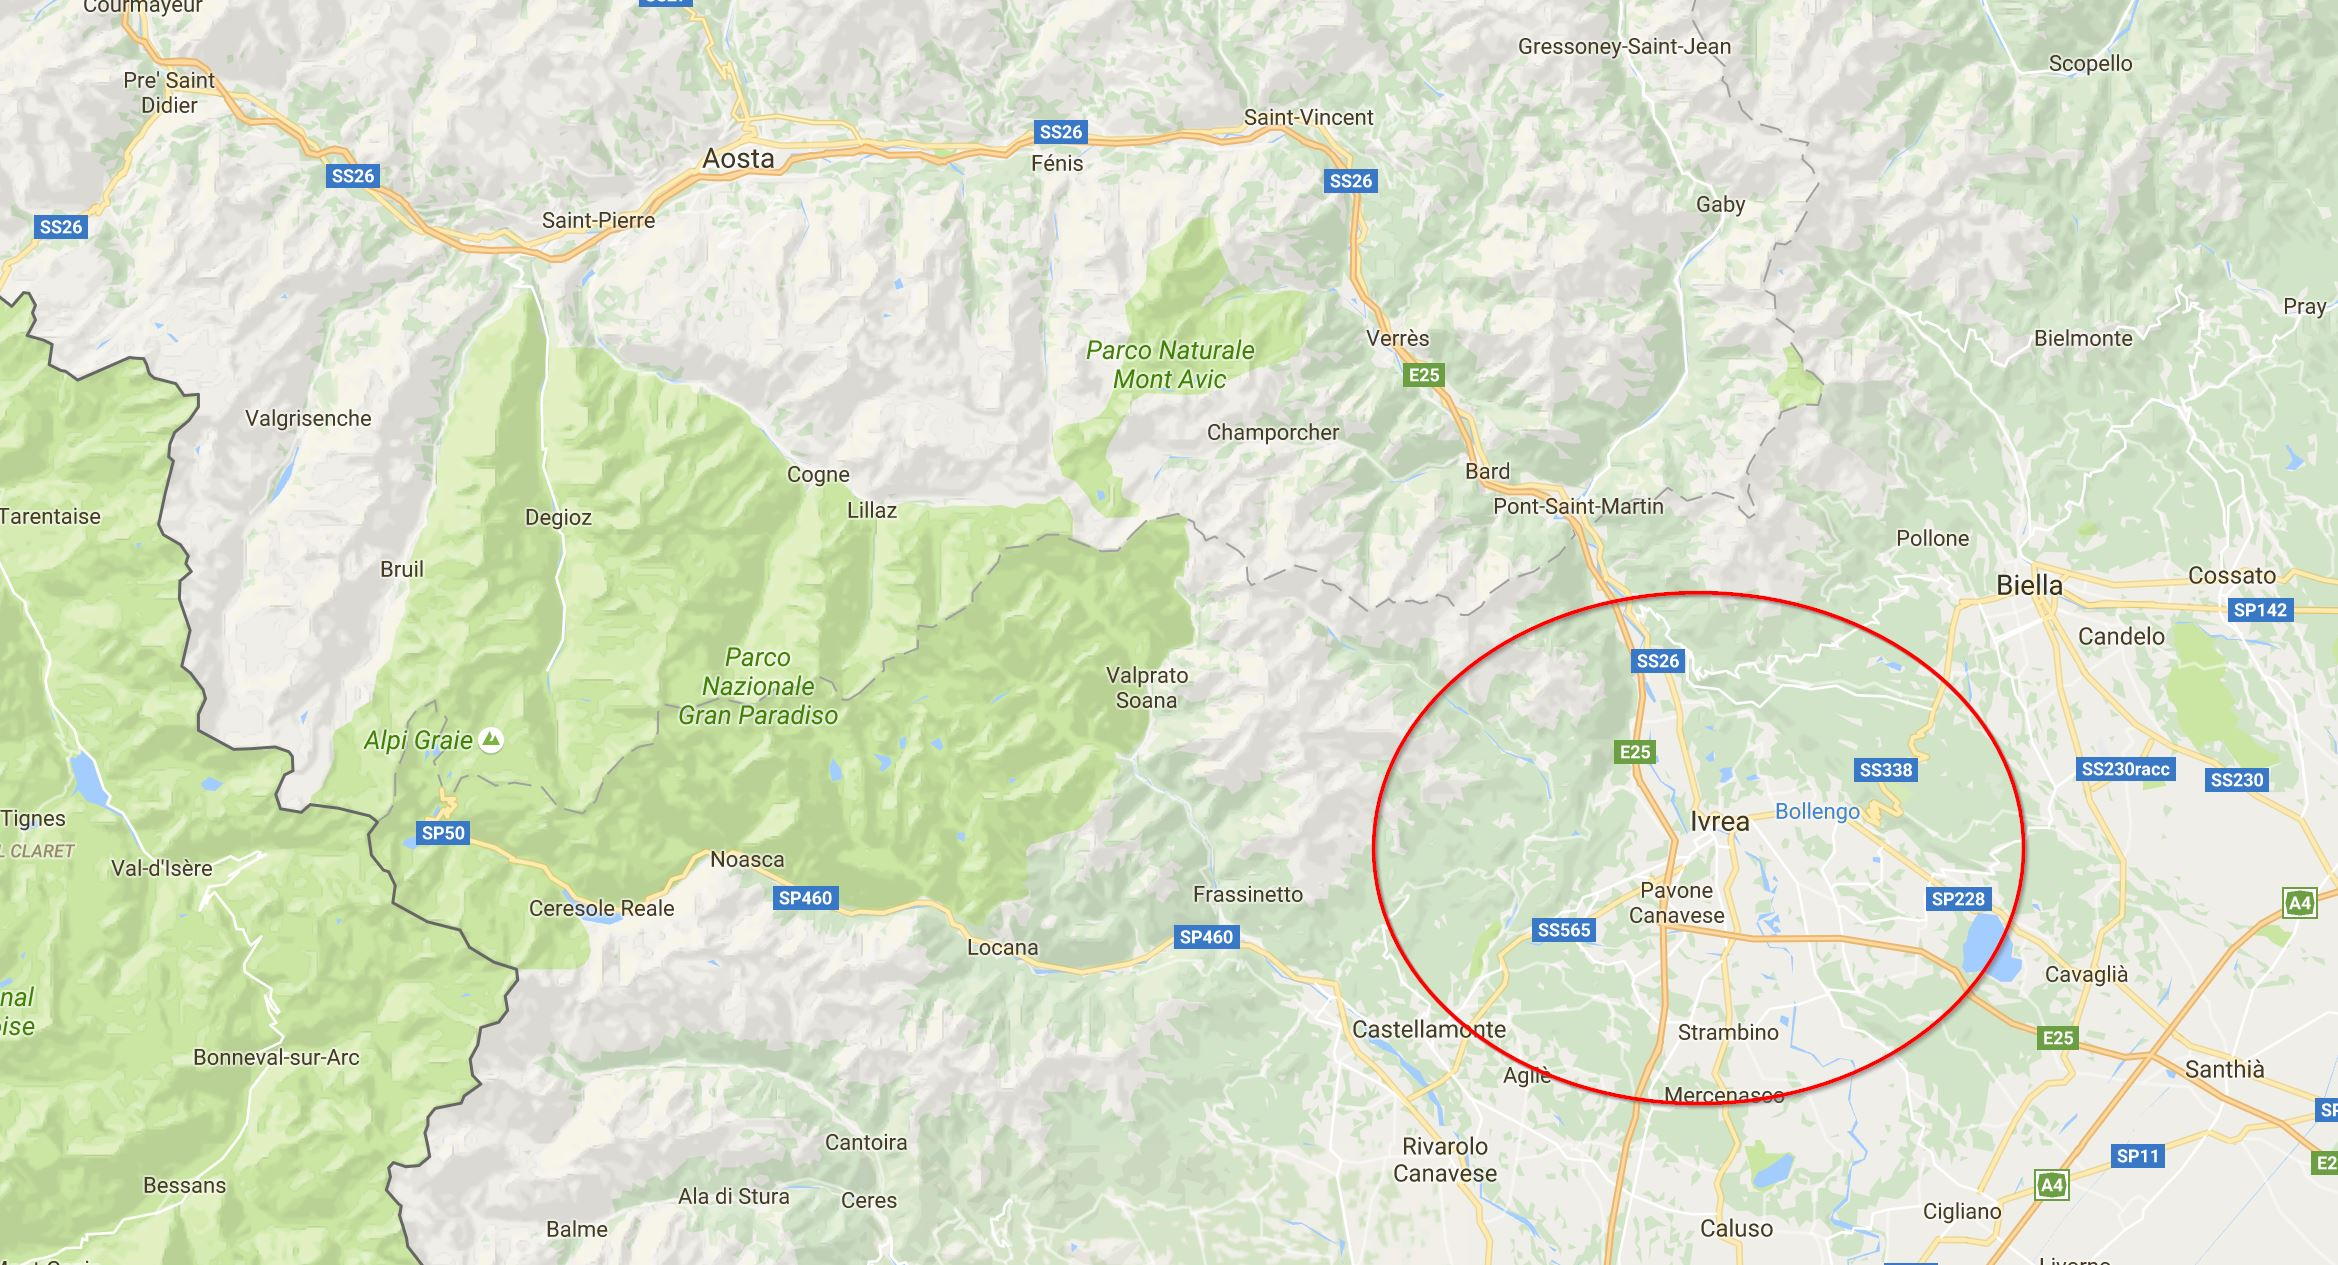 2016-08-17-17_16_57-google-maps.jpg